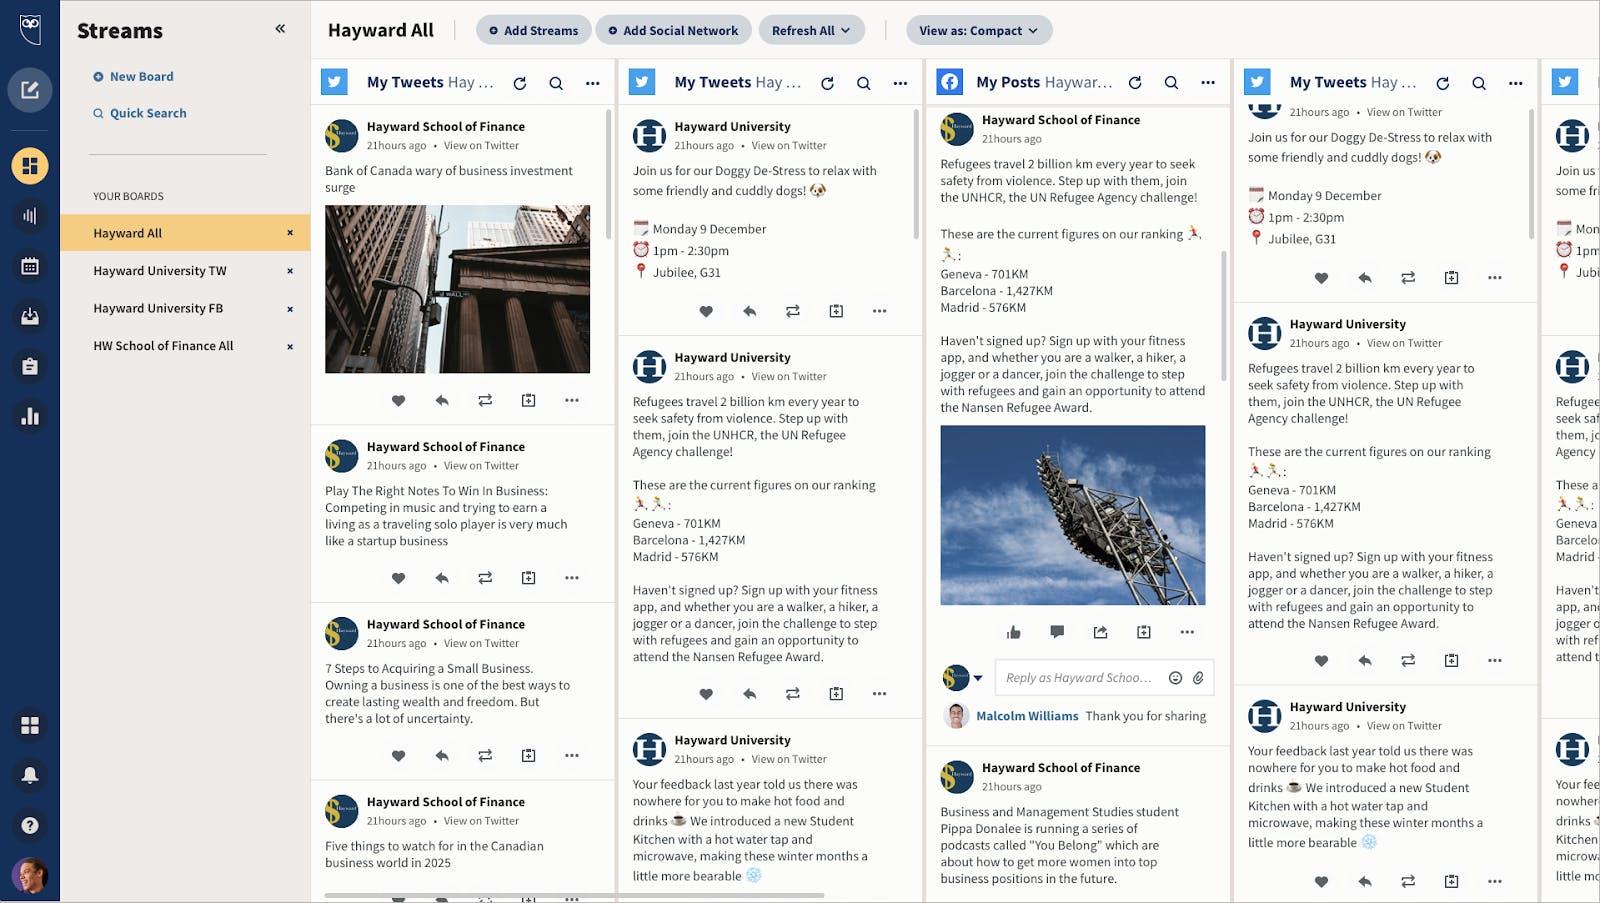 screenshot of hootsuite streams dashboard for social media monitoring tool